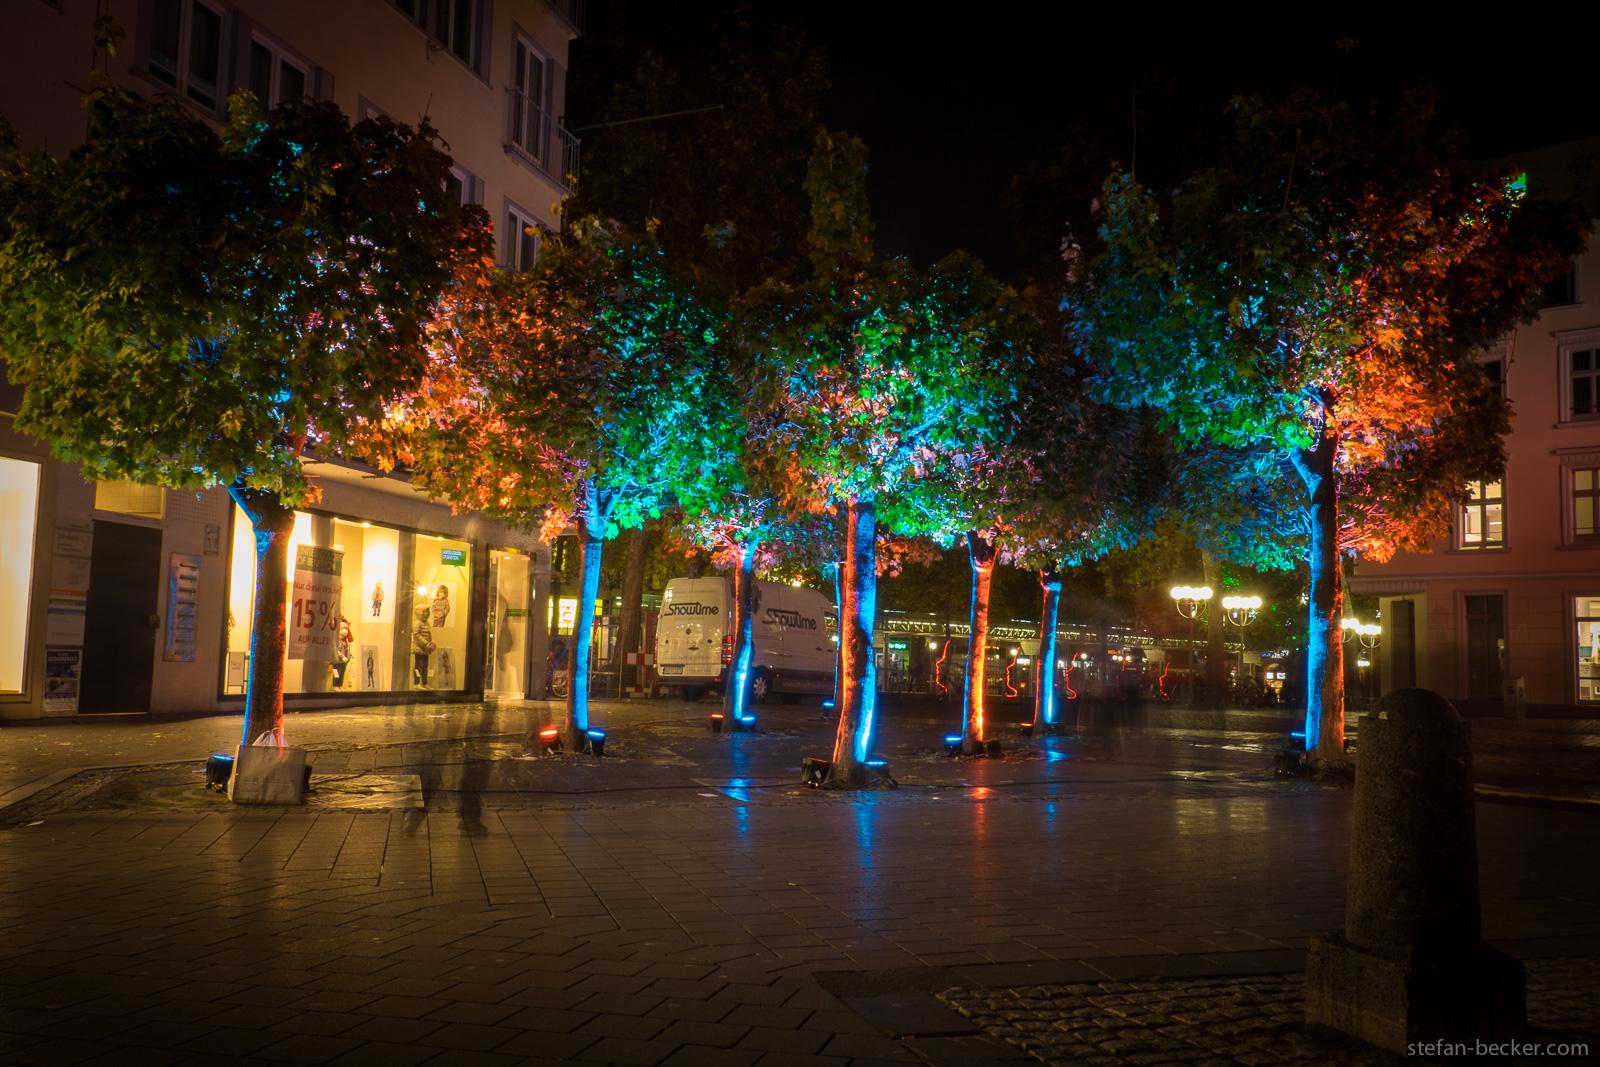 stb_Bonn_nacht-1